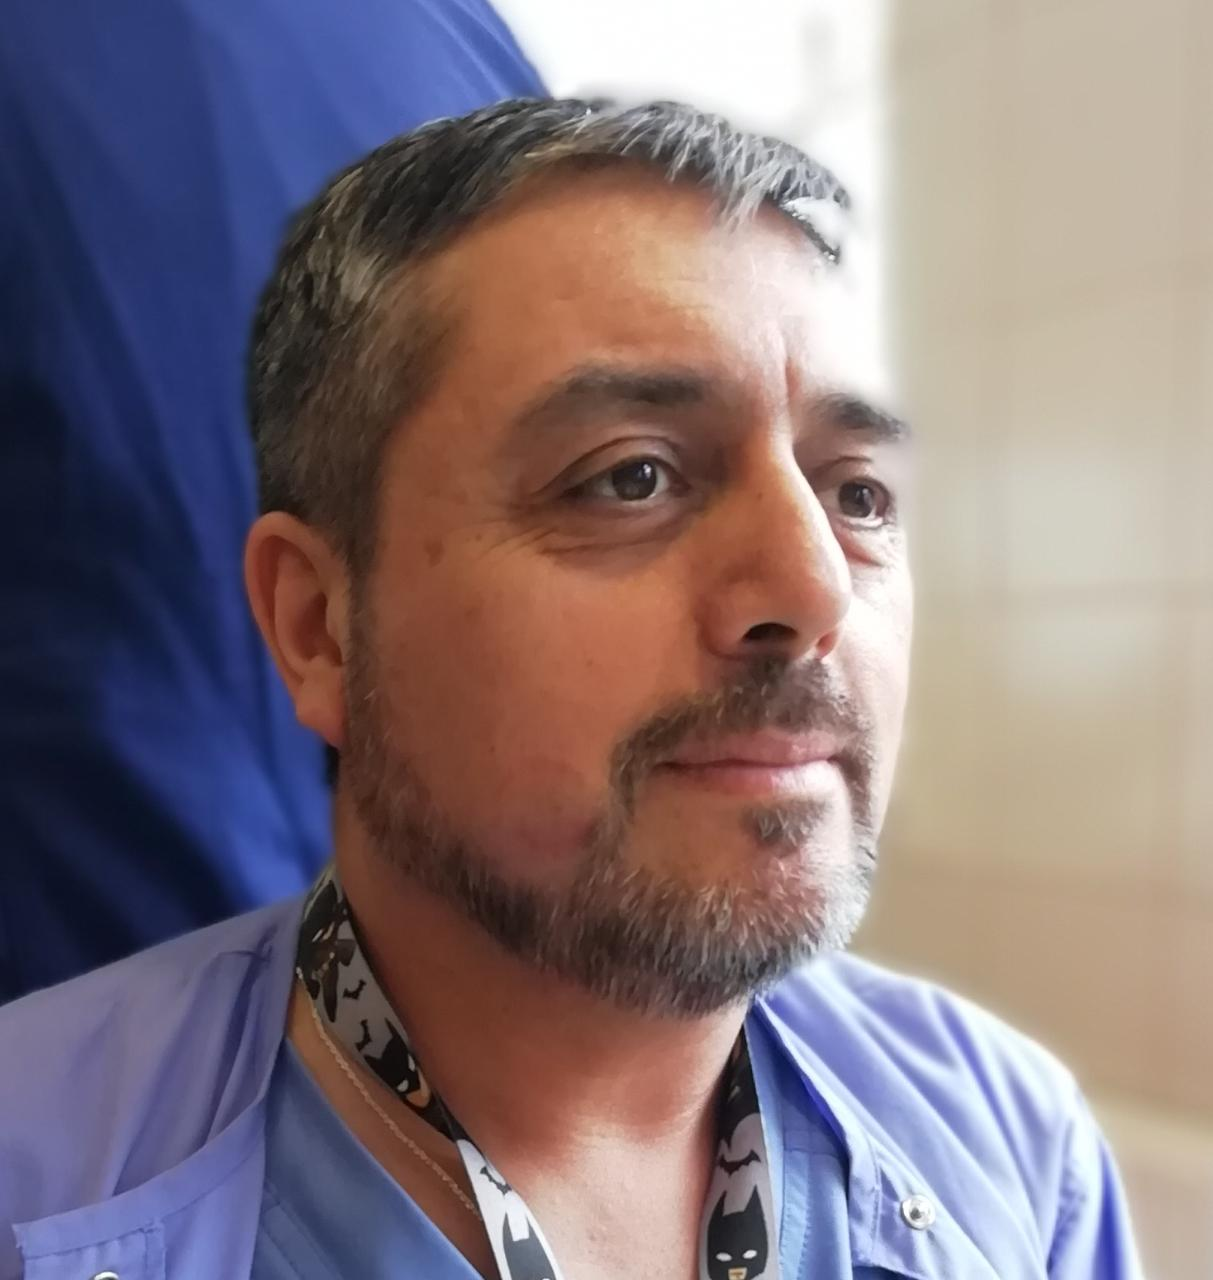 Juan Carlos Olea Castillo